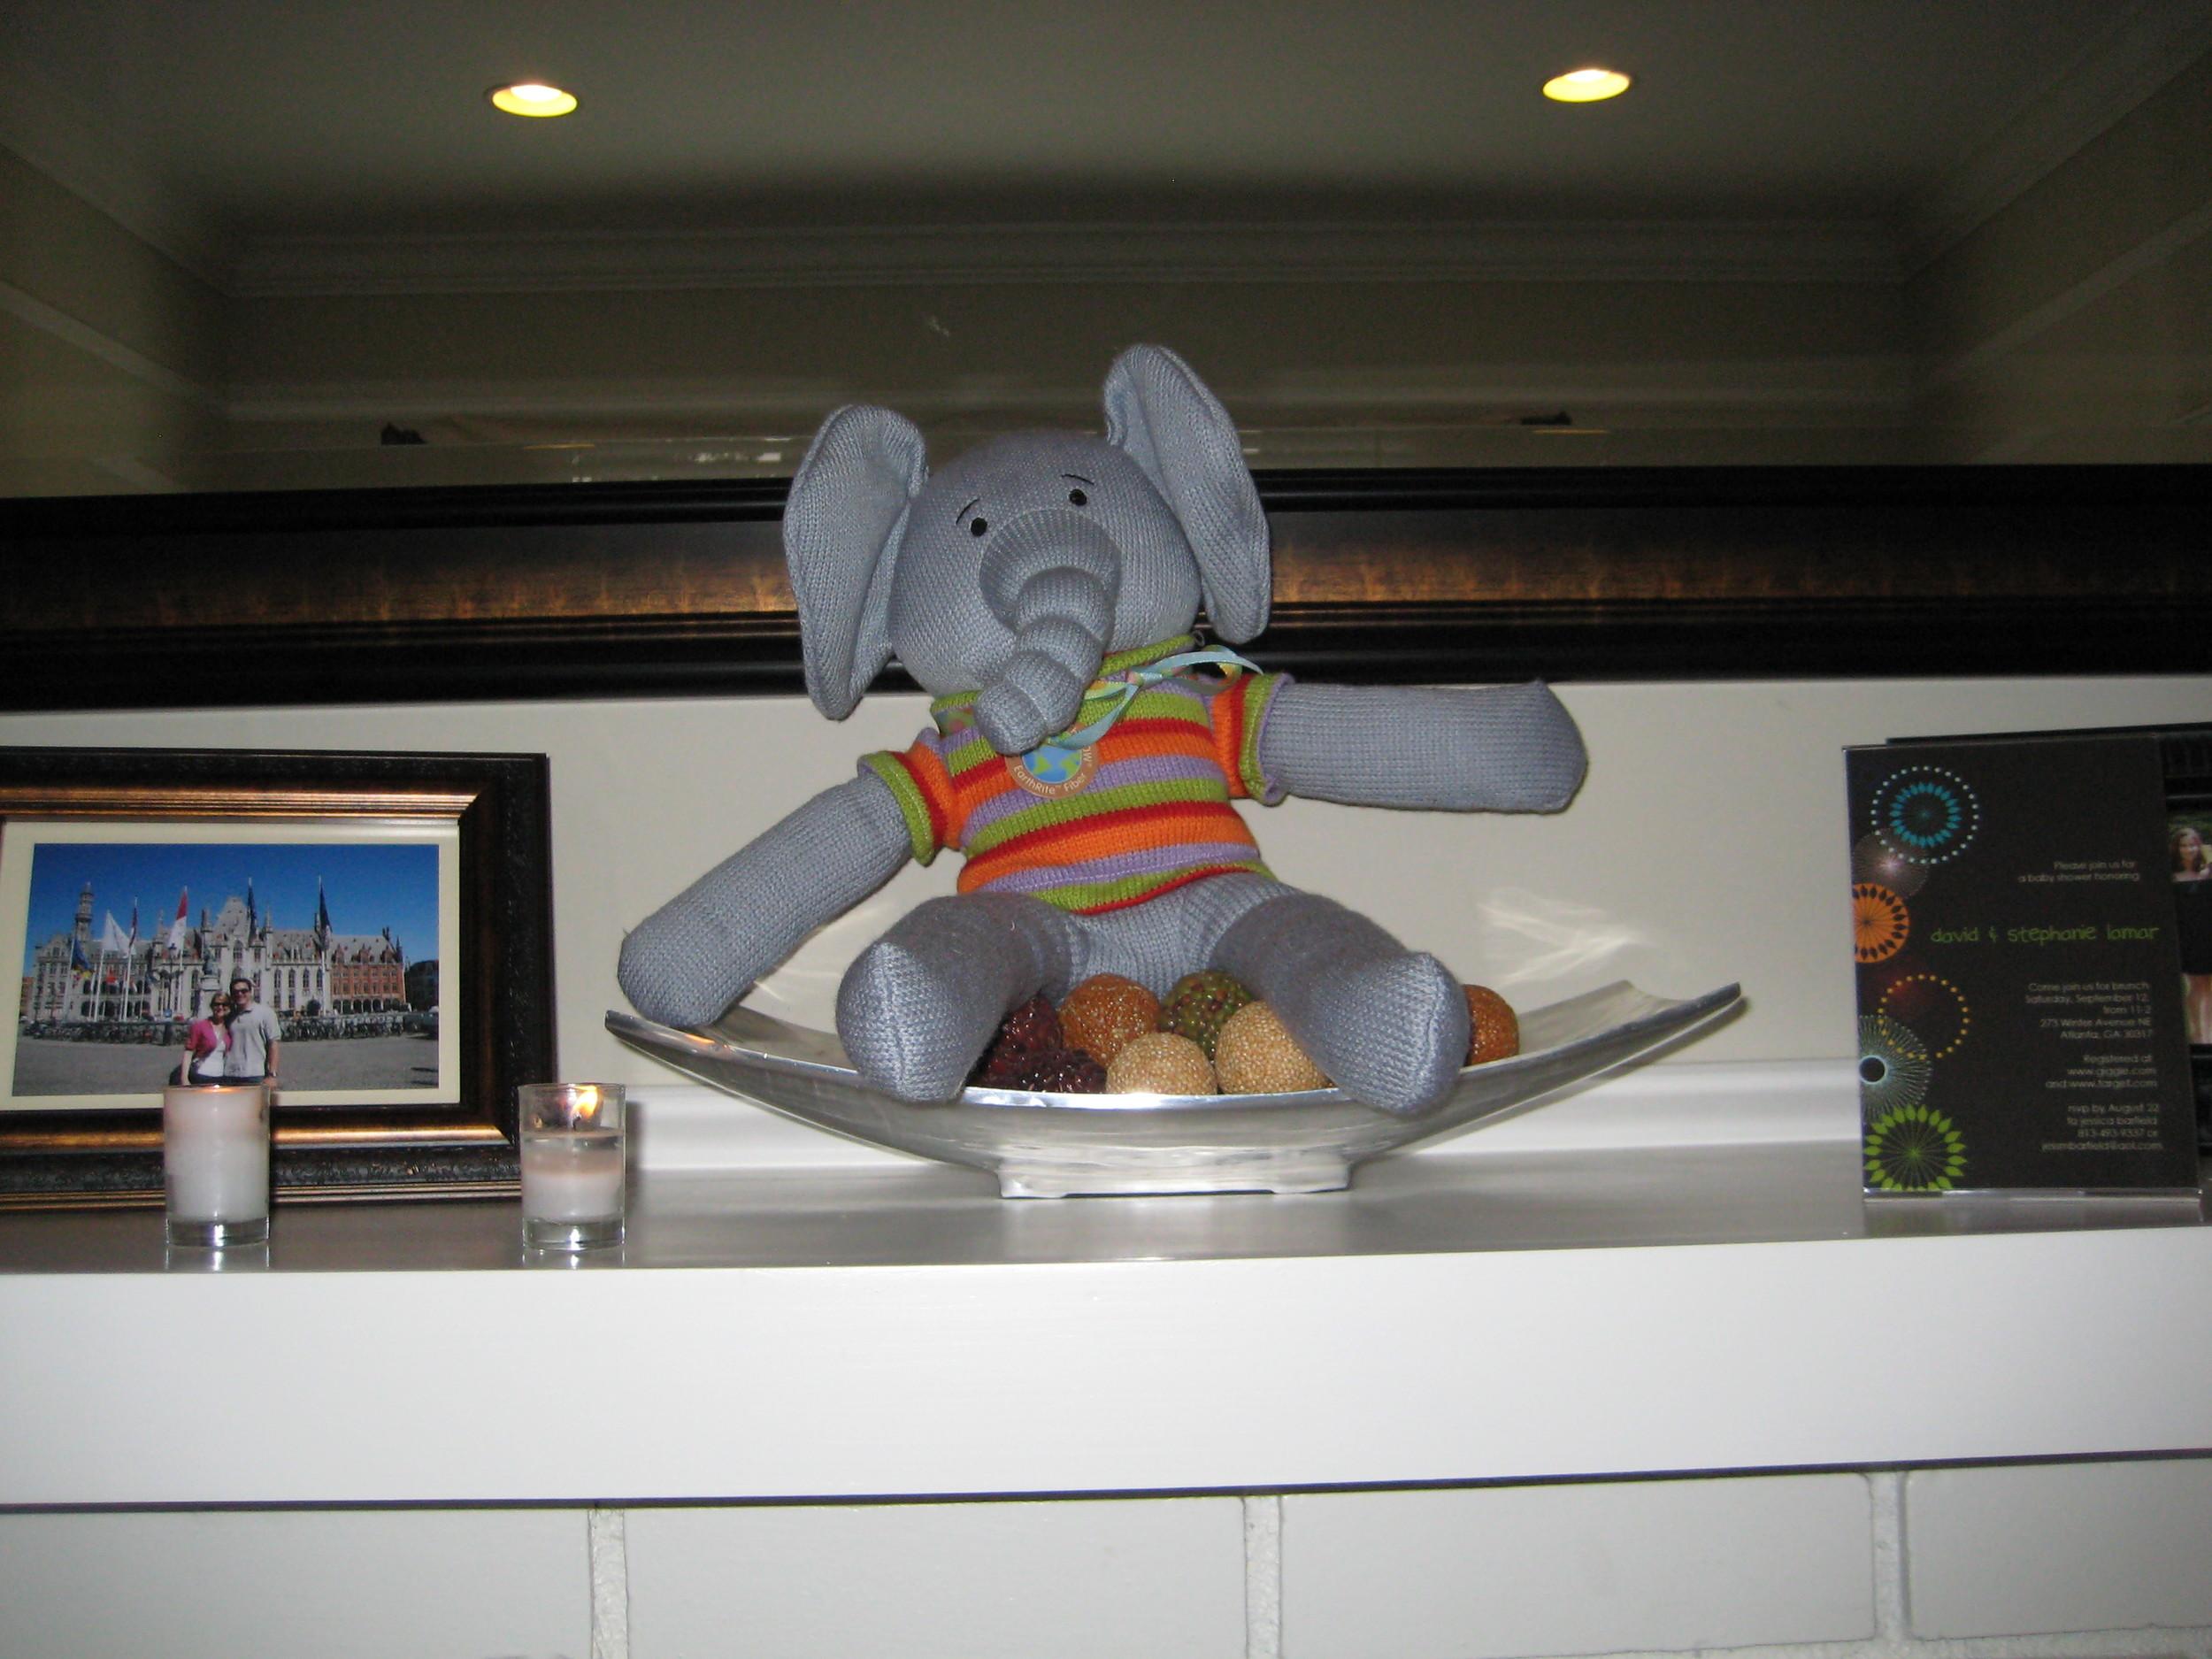 jack's new stuffed elephant